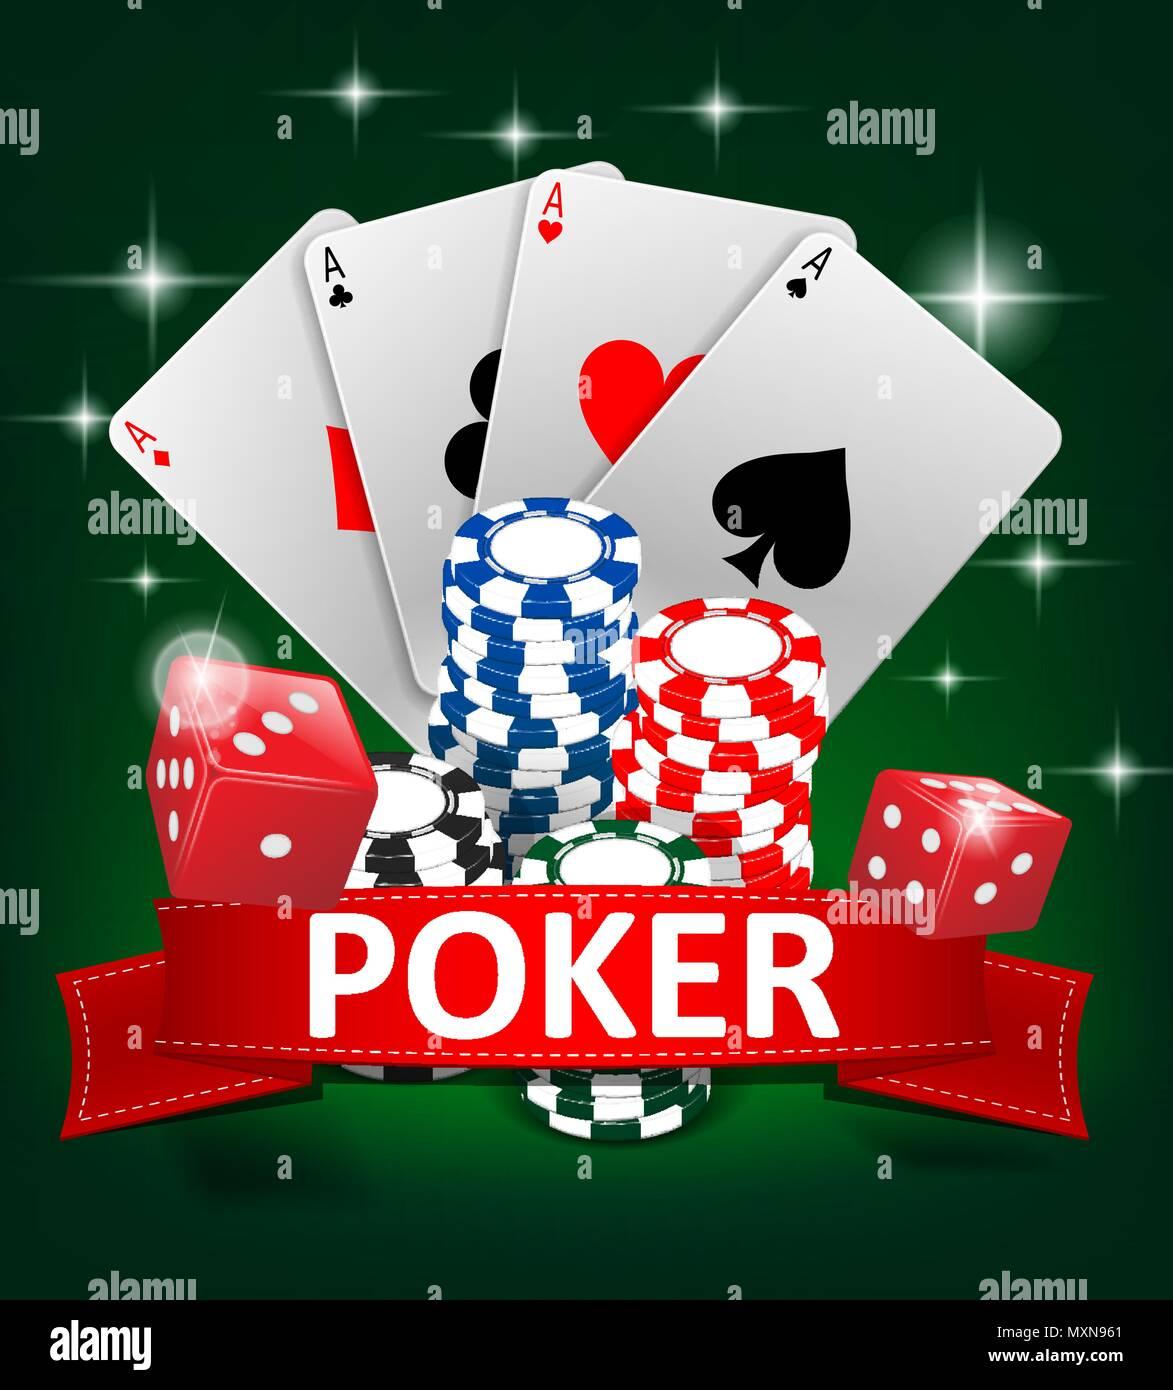 Card casino poker mantra casino